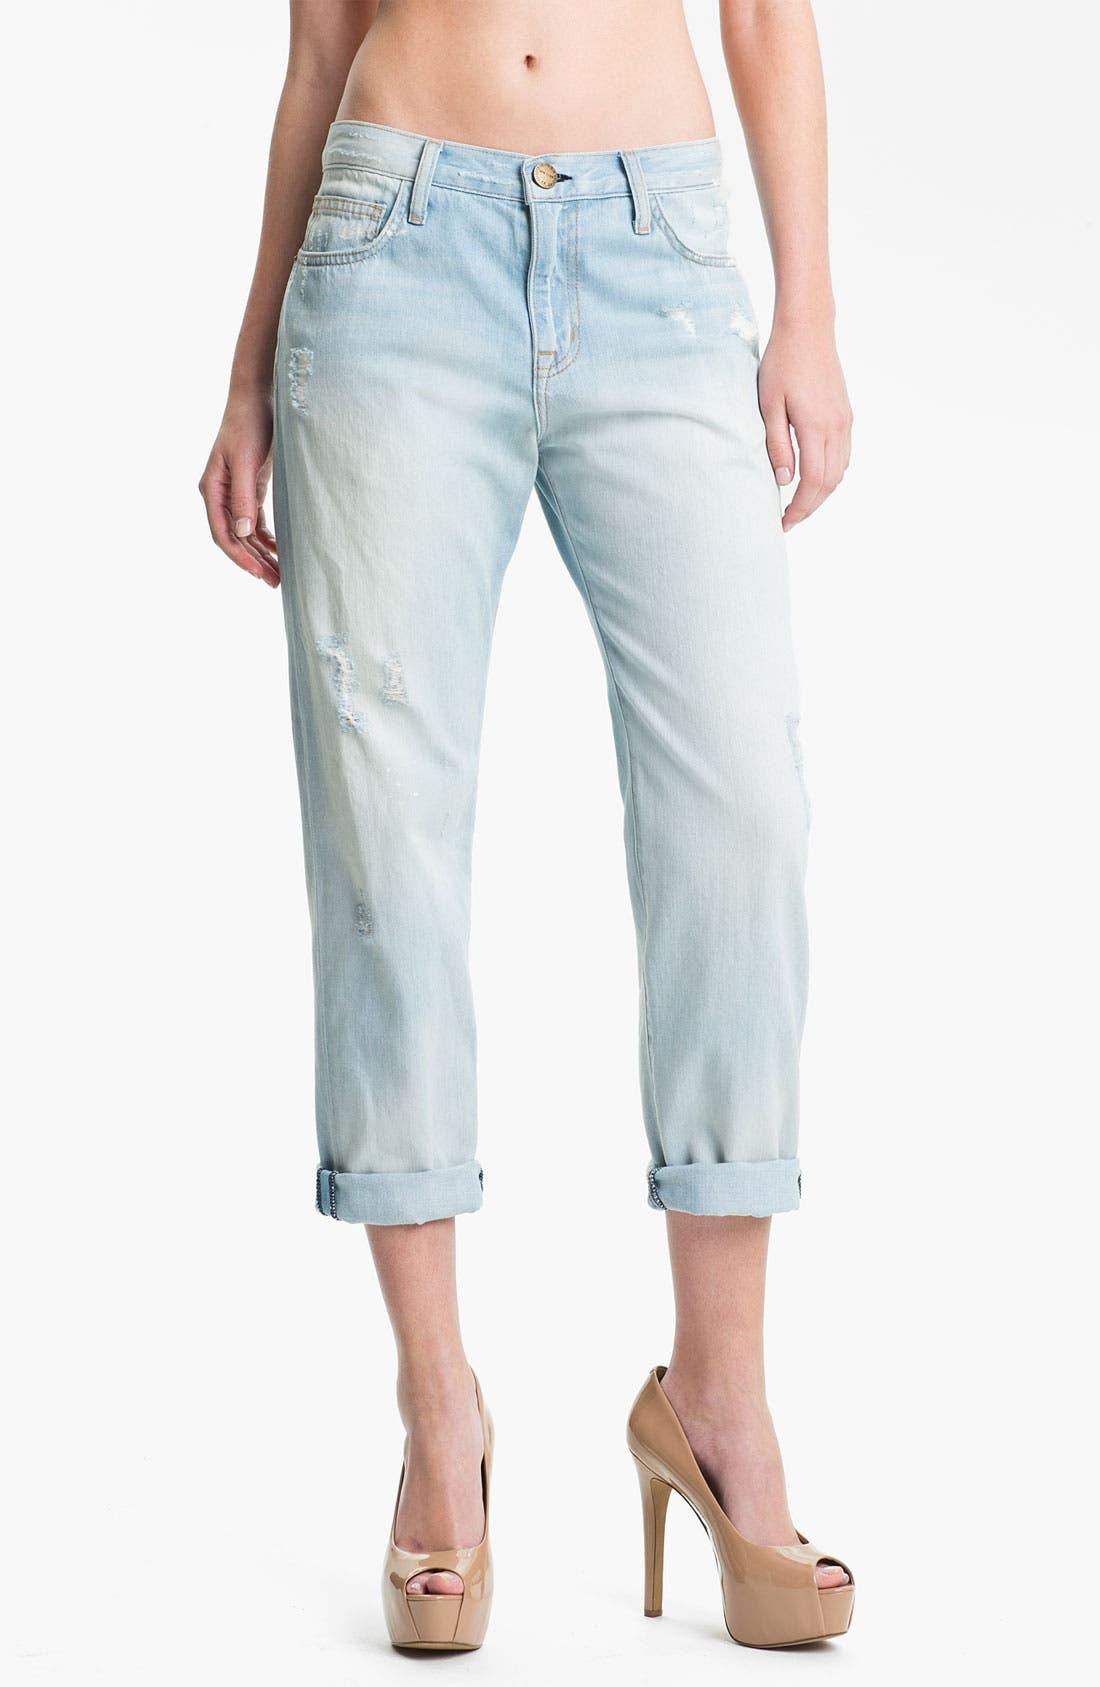 Main Image - Current/Elliott 'The Boyfriend' Distressed Jeans (Parlor/Destroy)